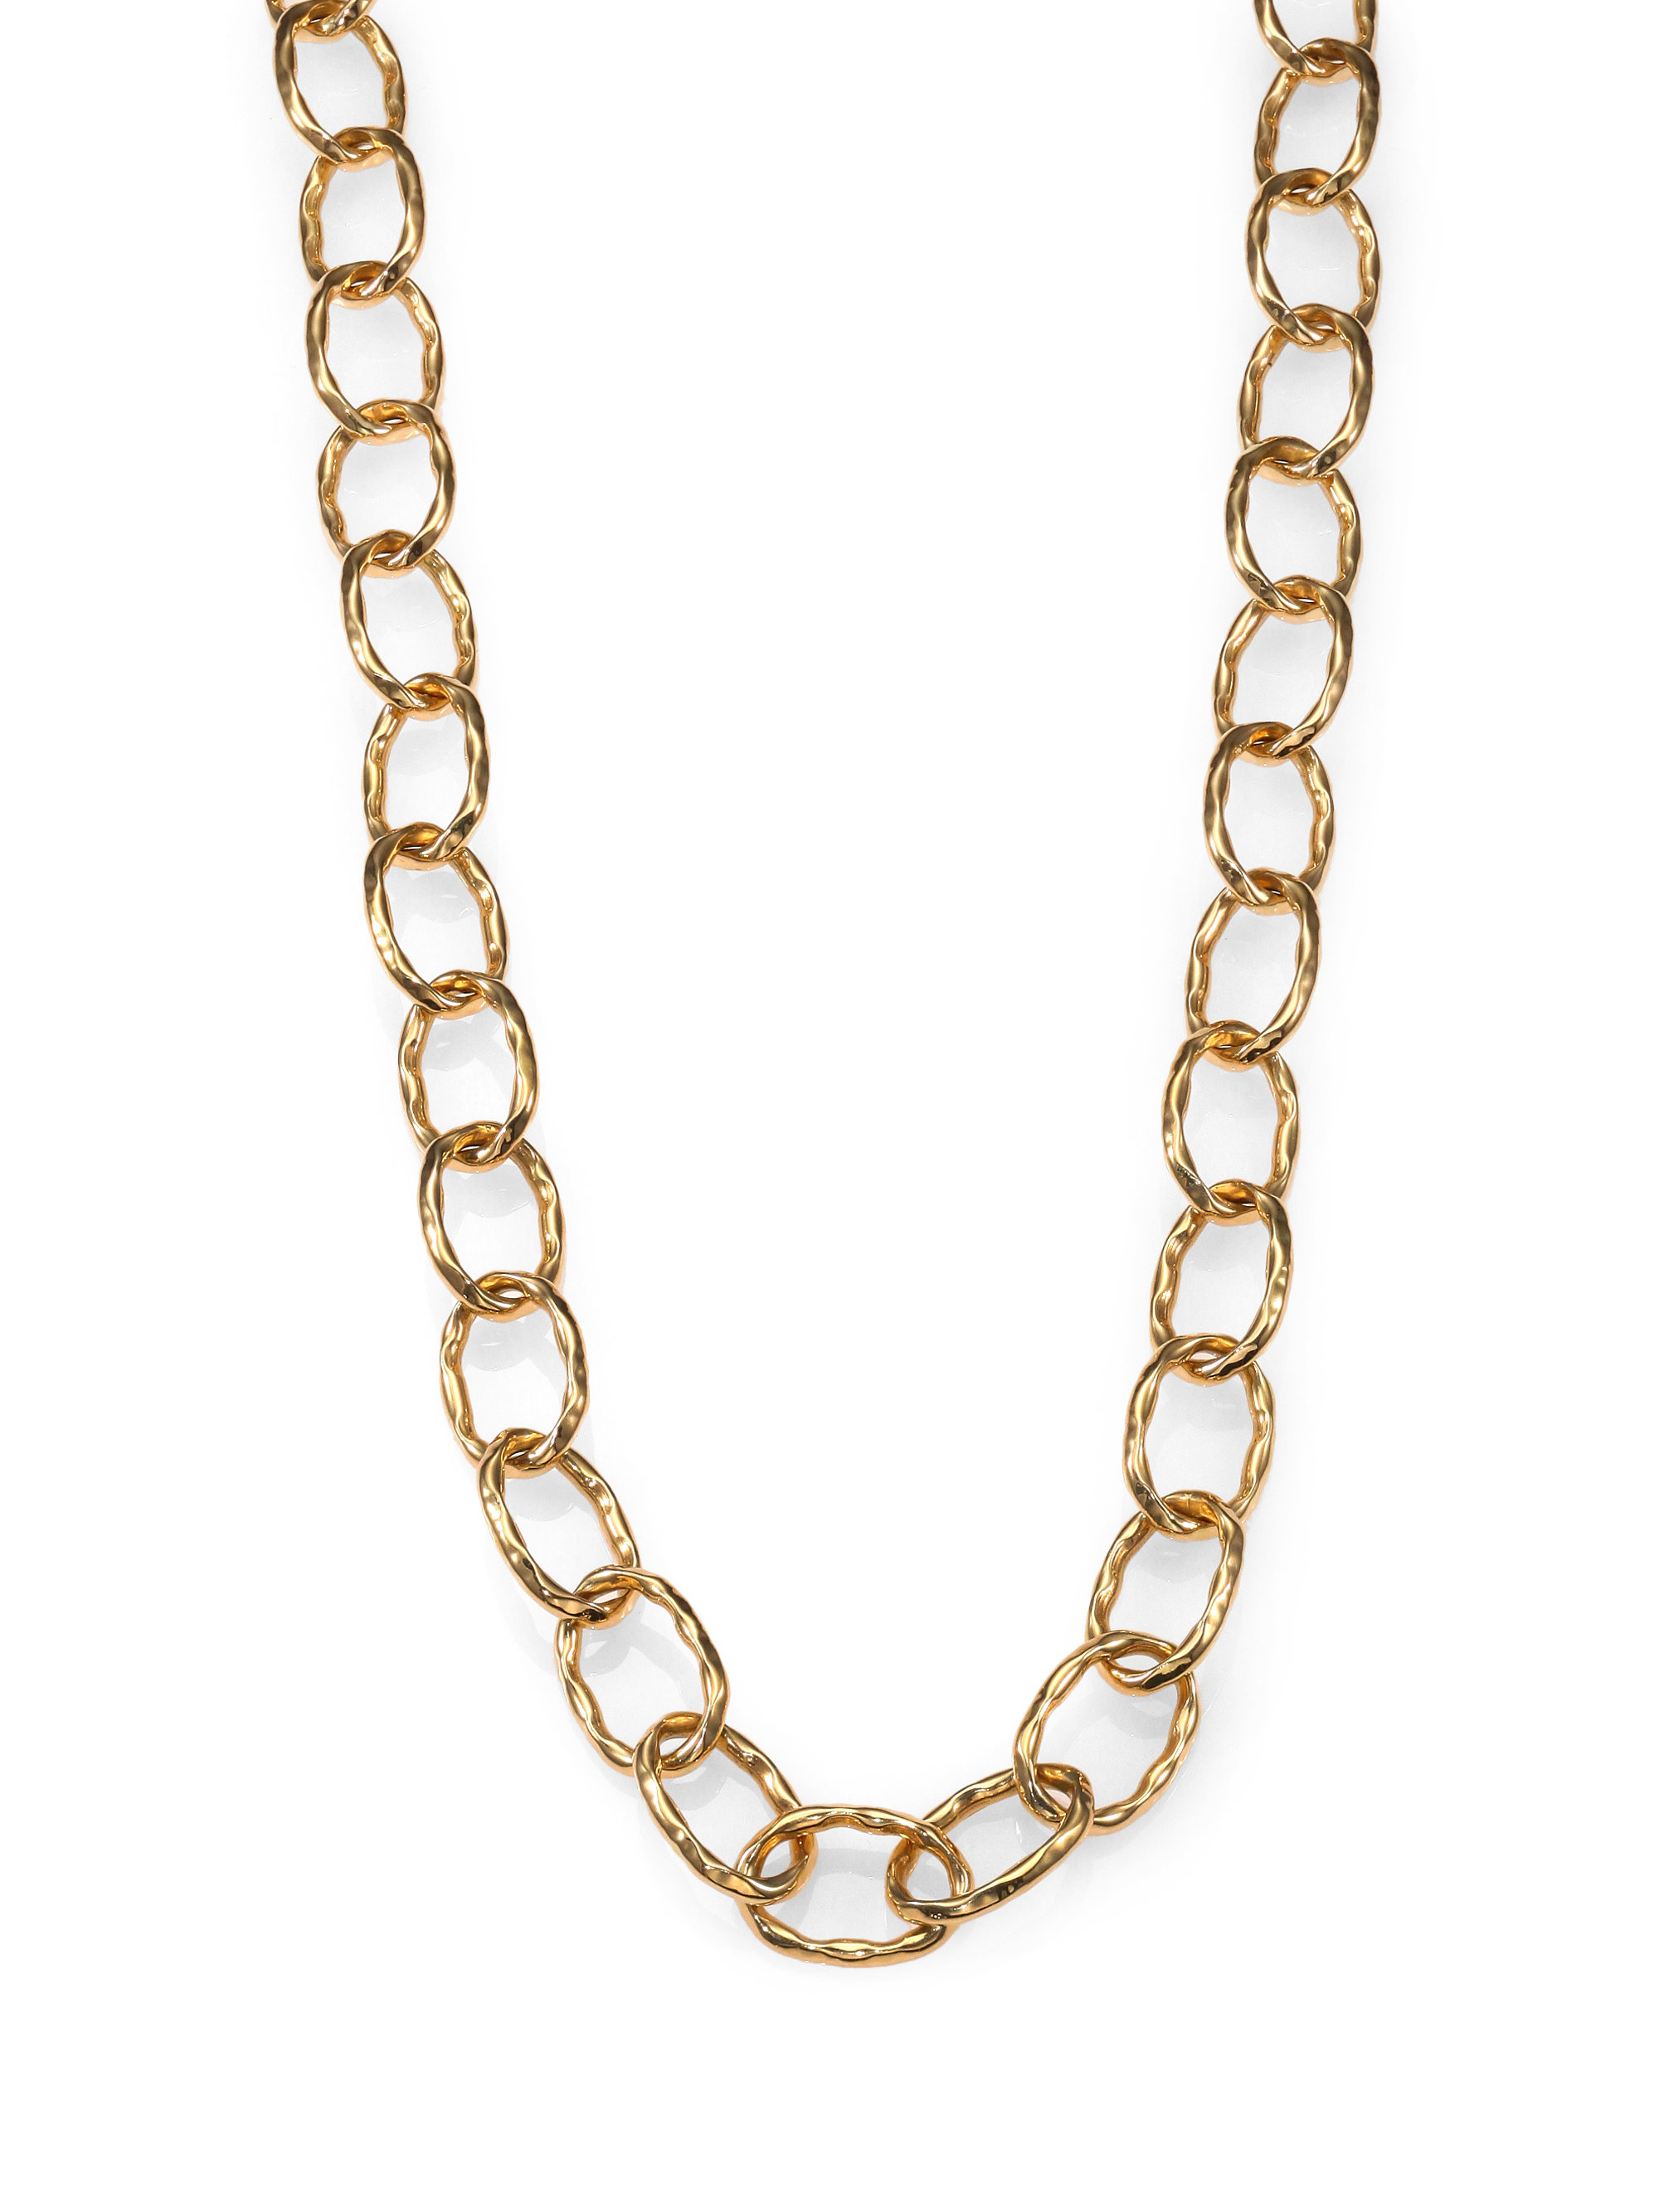 Roberto Coin Martellato 18k Yellow Gold Chain Necklace In